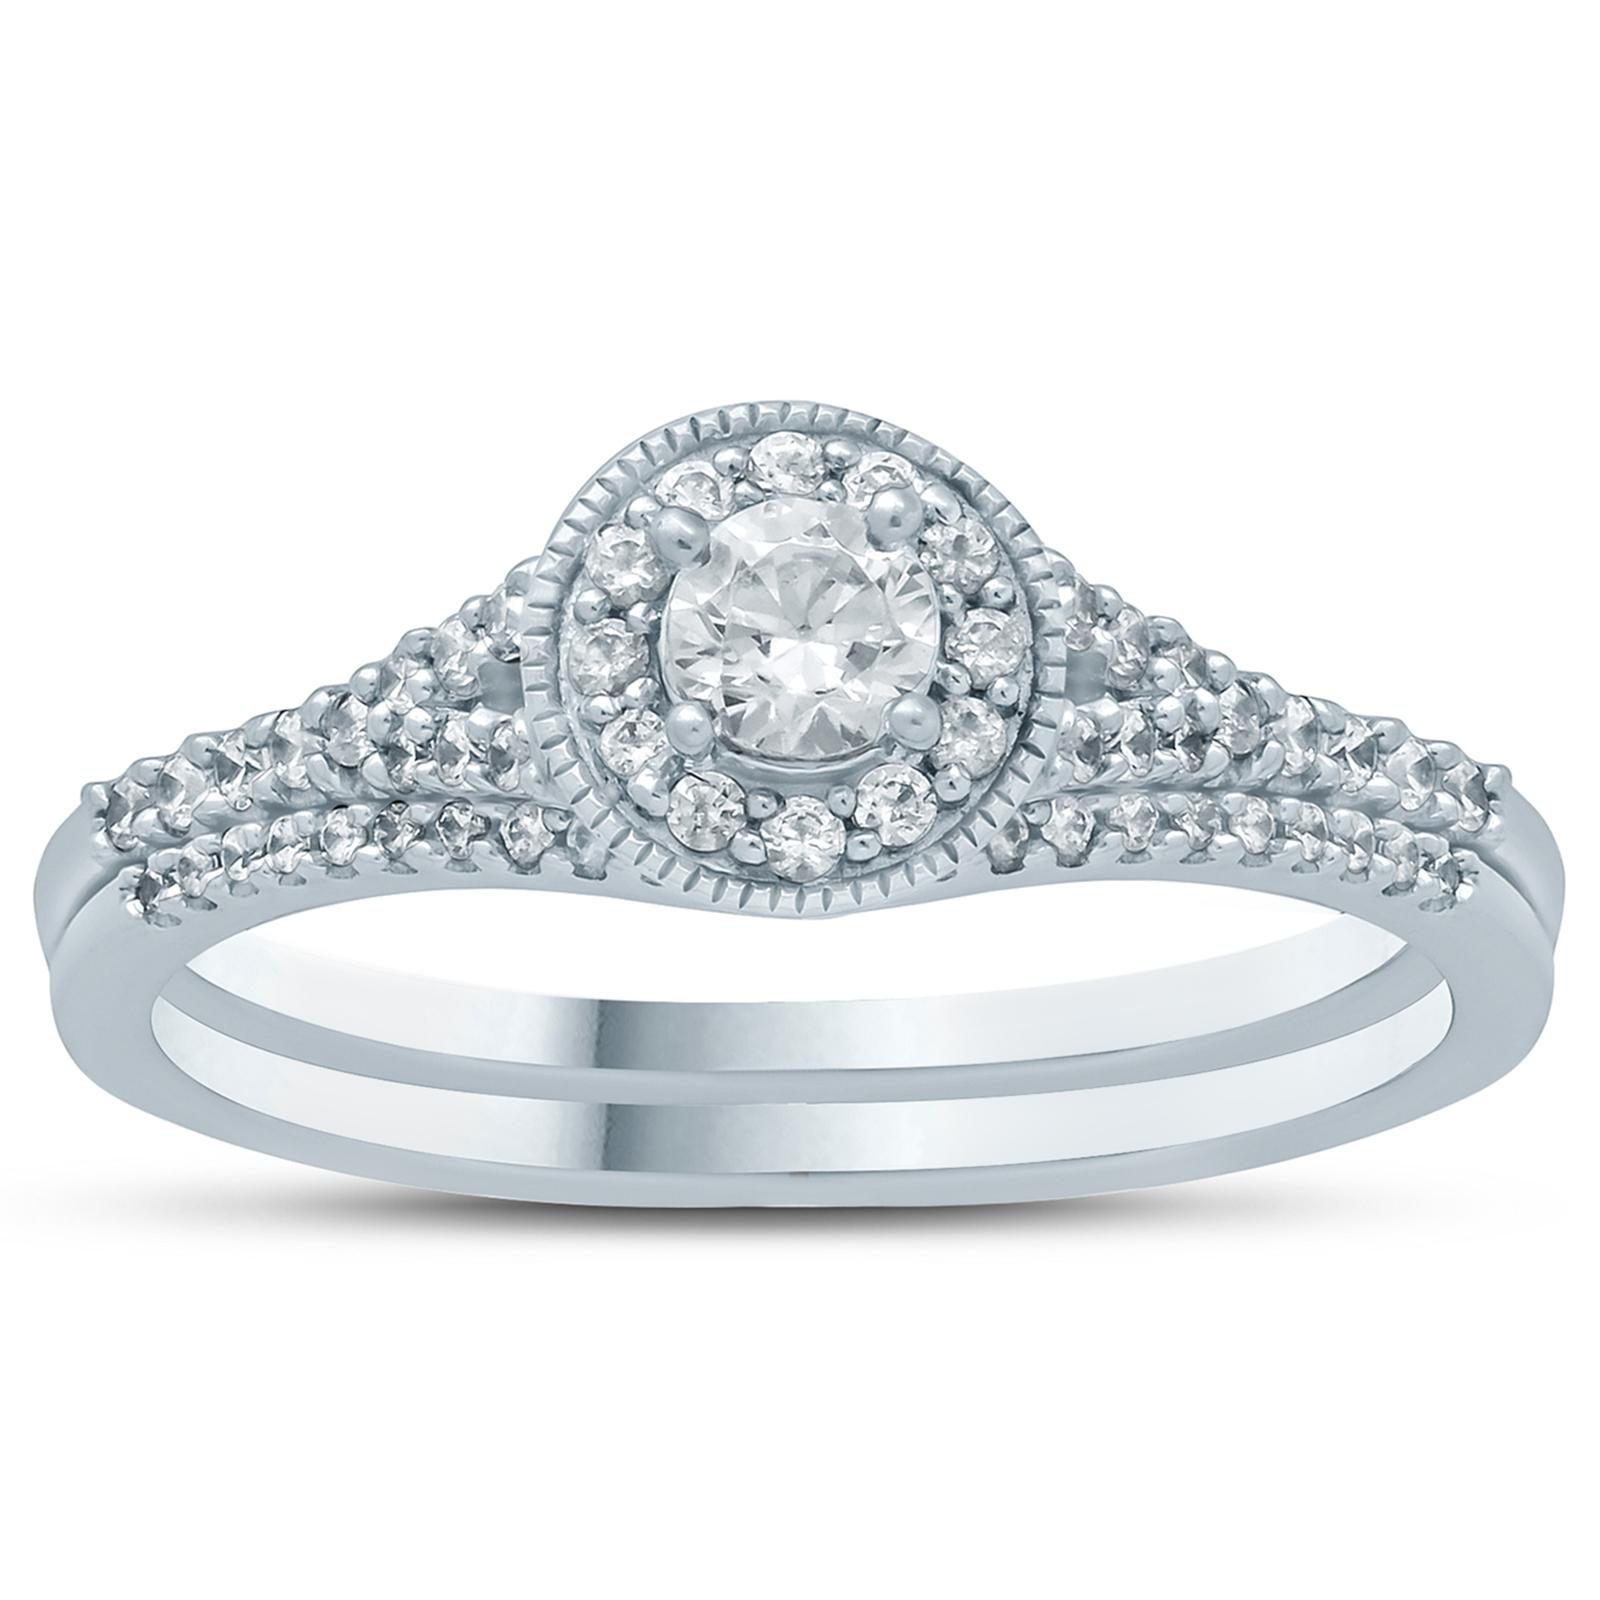 1/2 Carat TW Diamond...